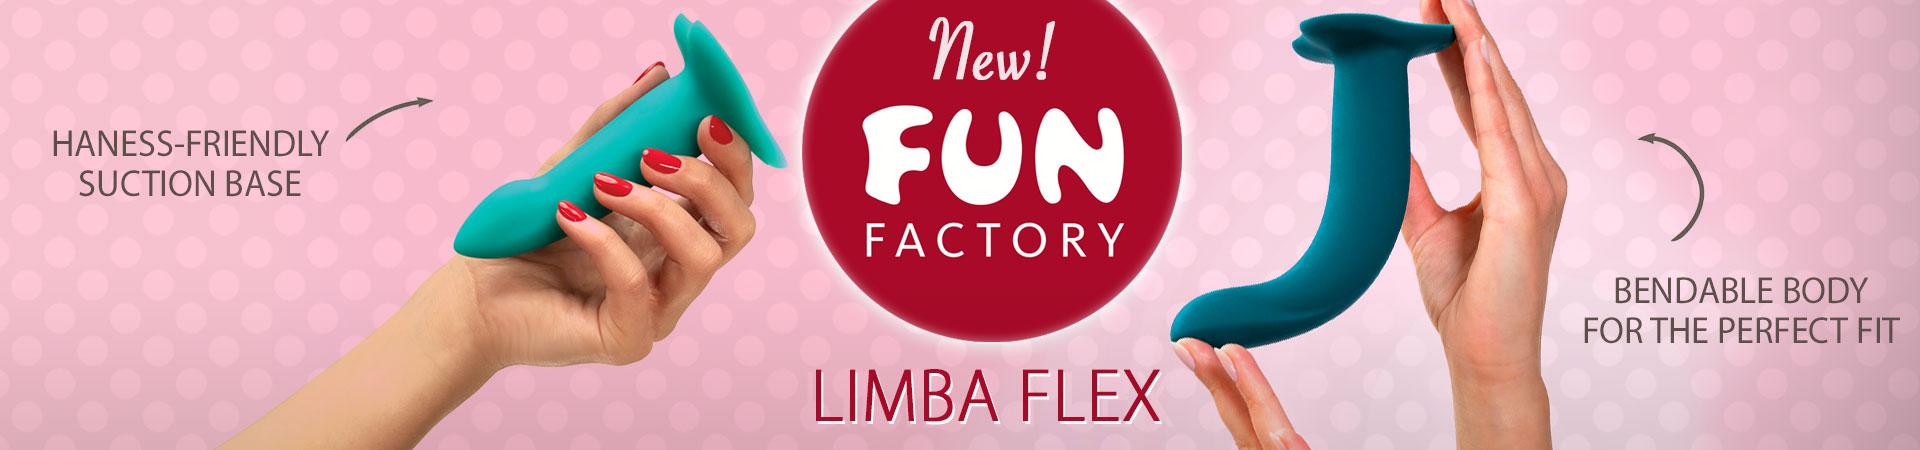 New Fun Factory Limba Flex!